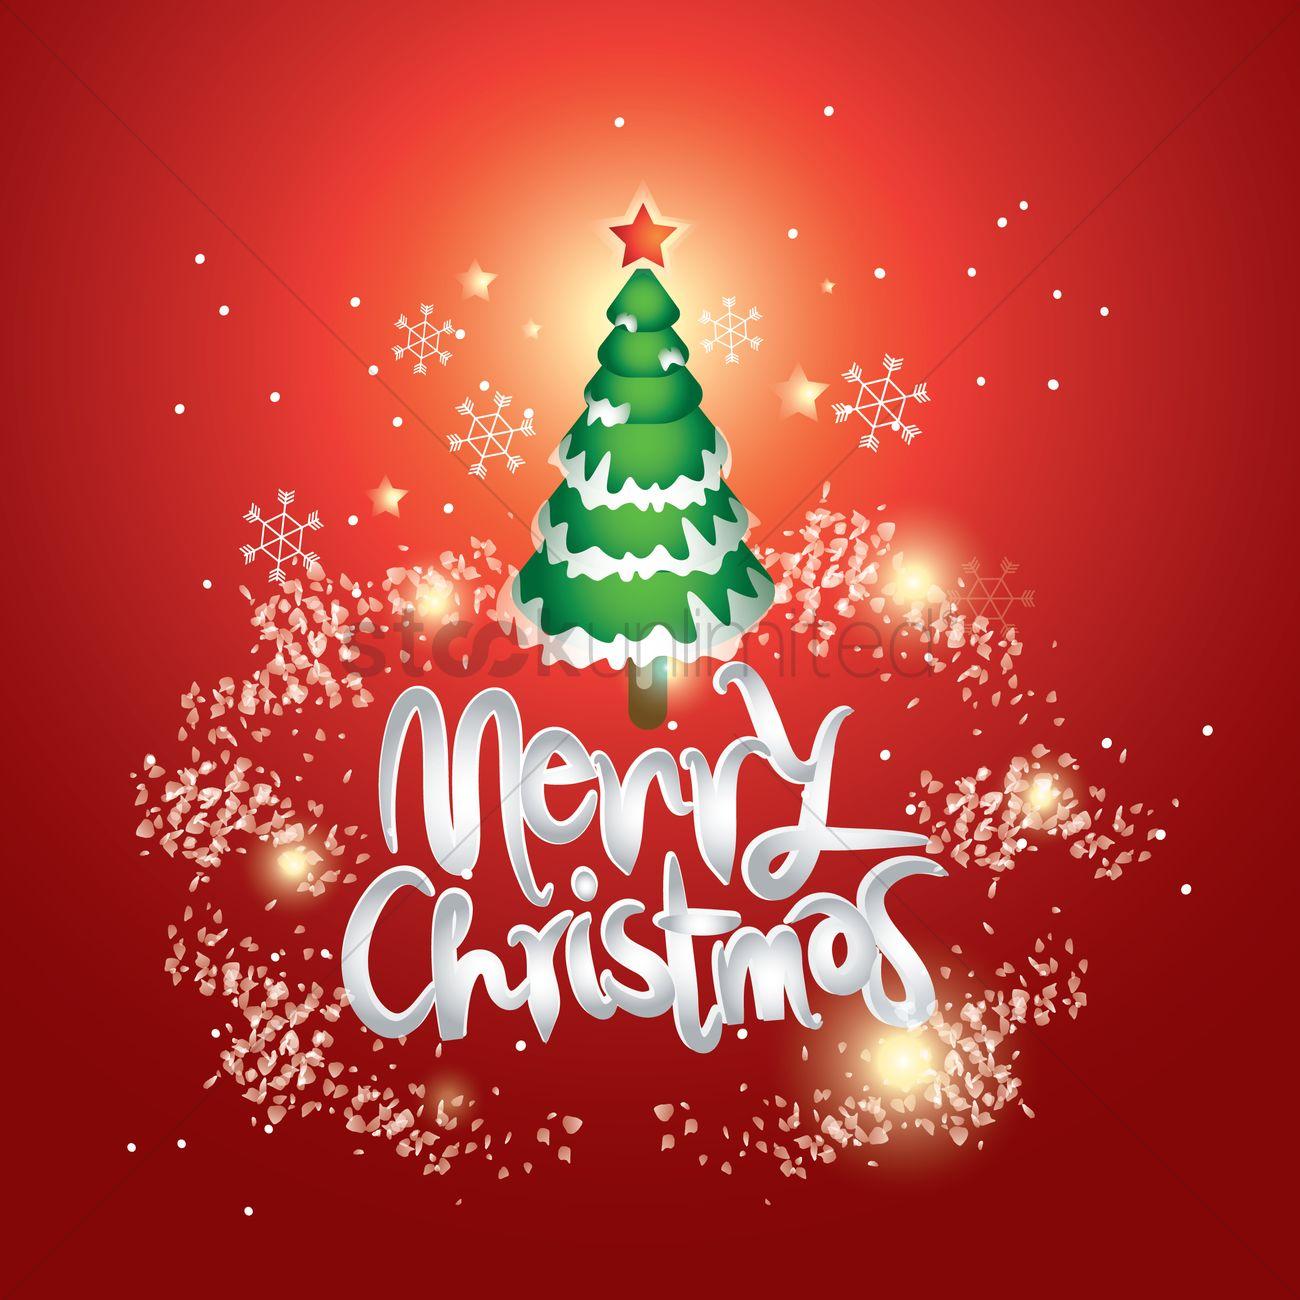 Merry Christmas Wallpaper.Merry Christmas Wallpaper Vector Image 1815435